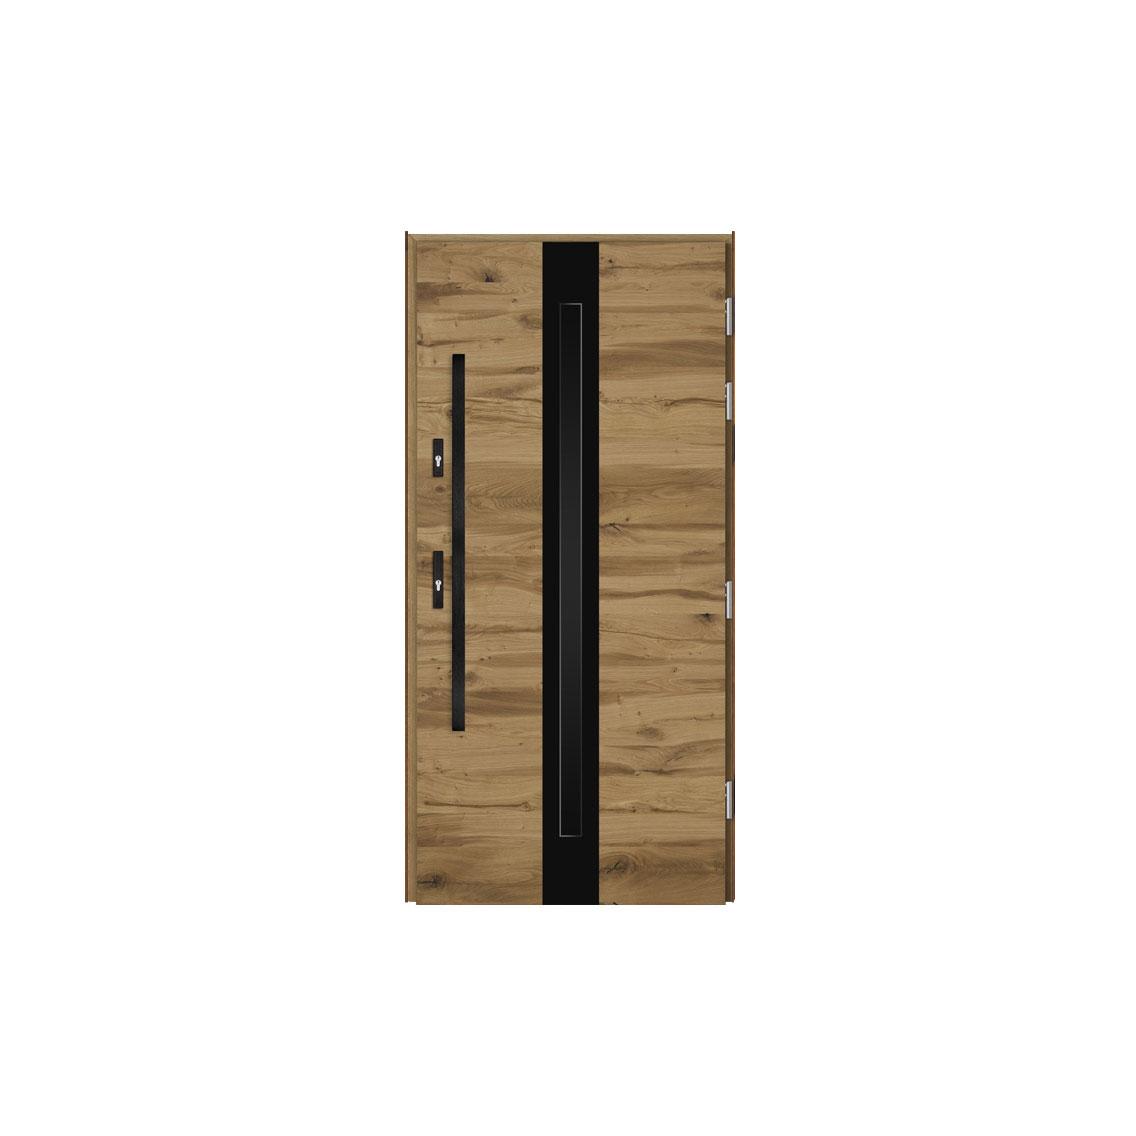 Koka durvis WD-17